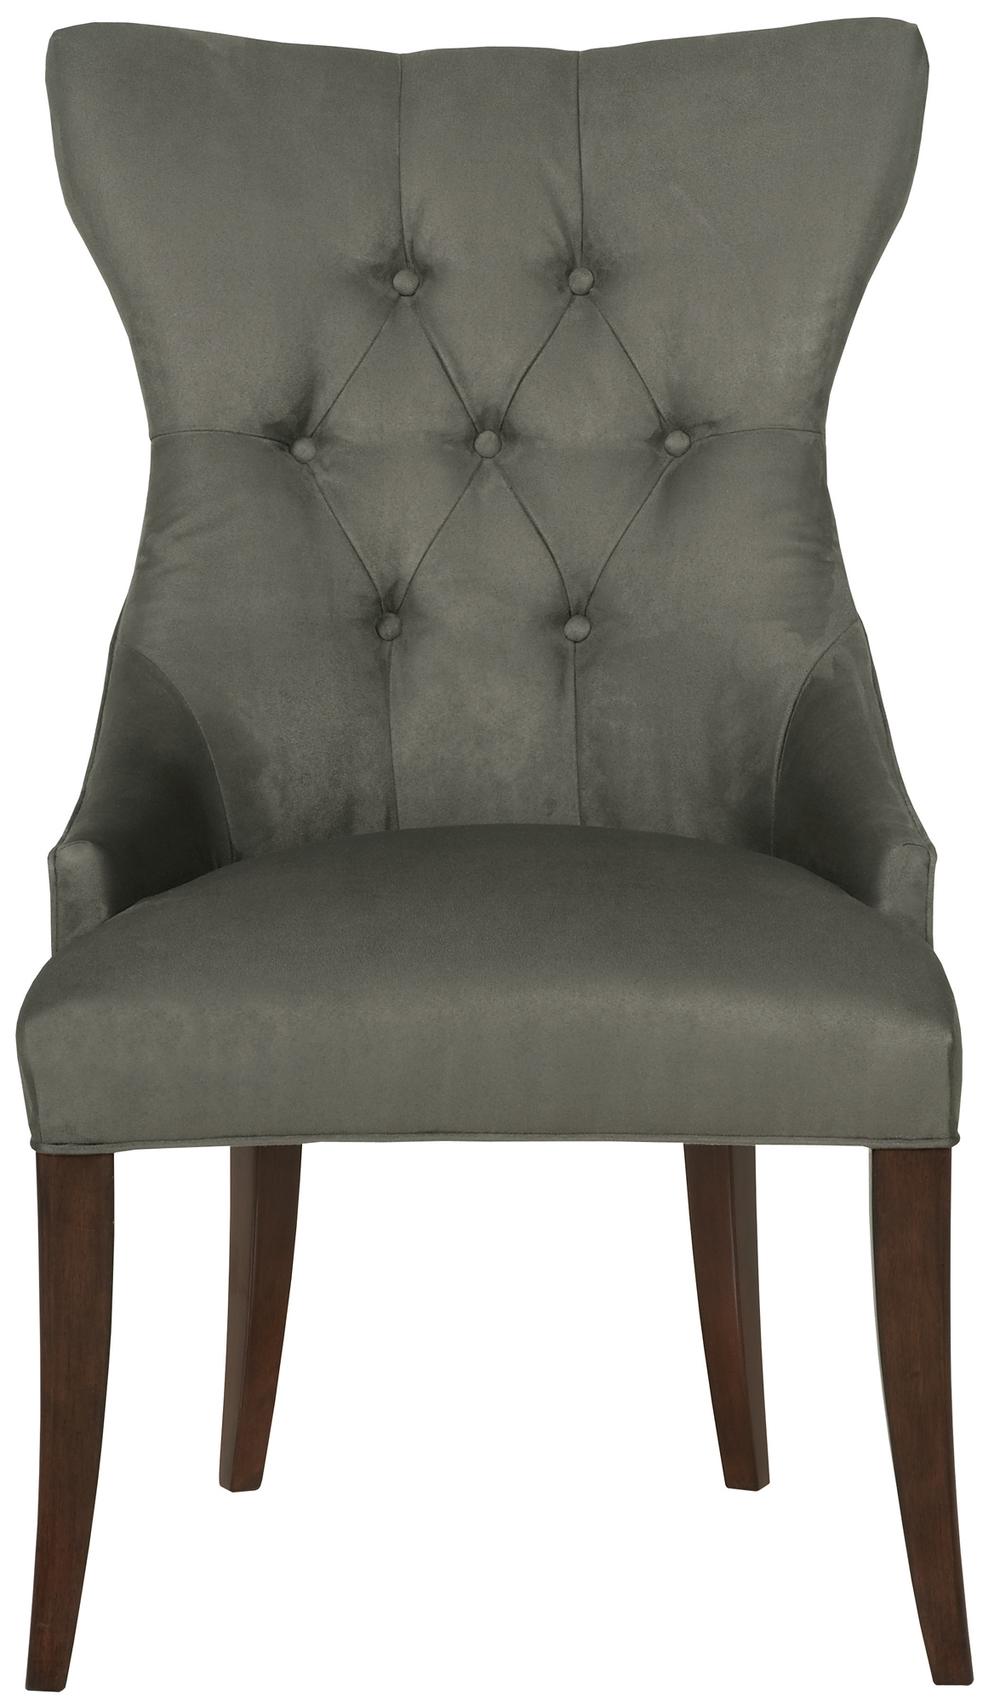 Bernhardt - Tufted Back Chair